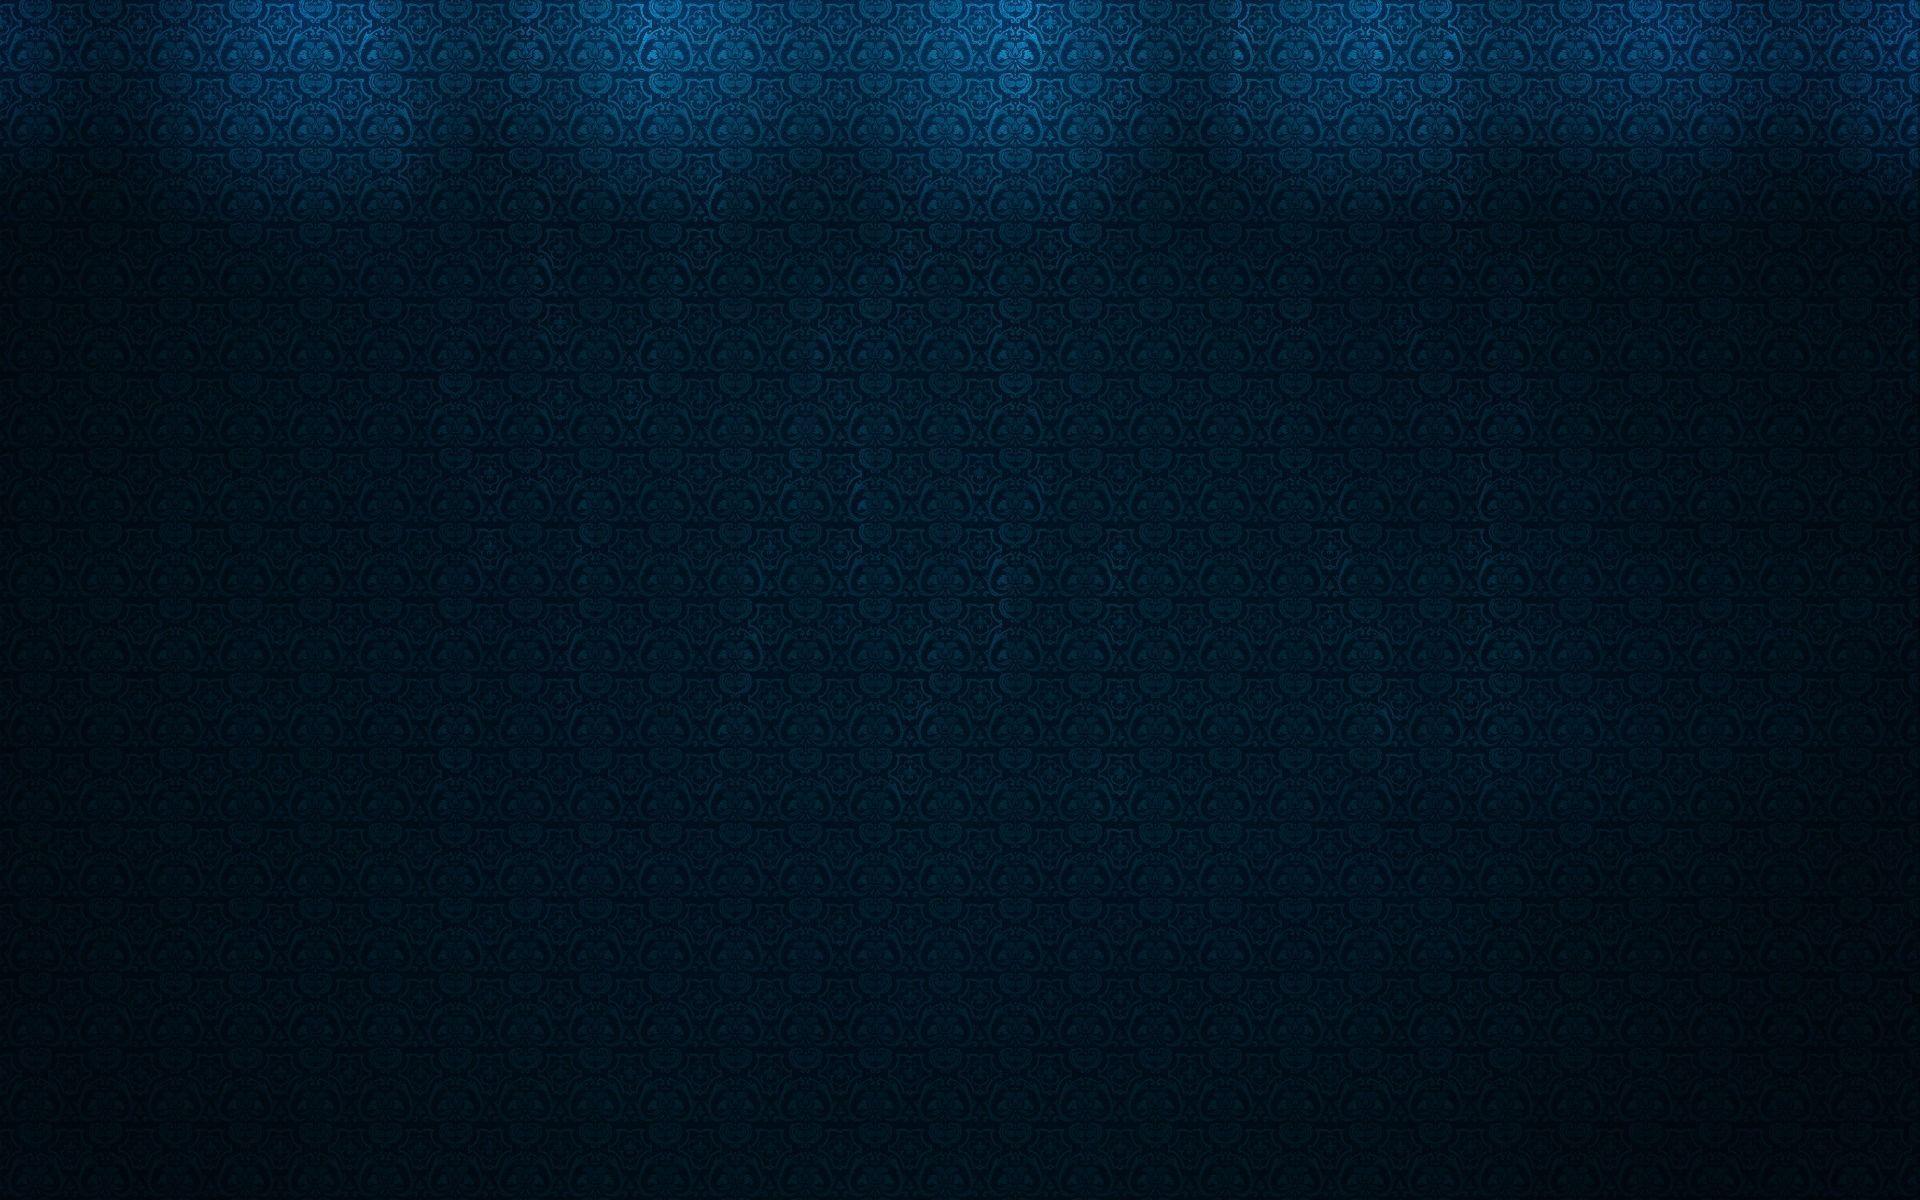 Navy Blue Backgrounds 1920x1200